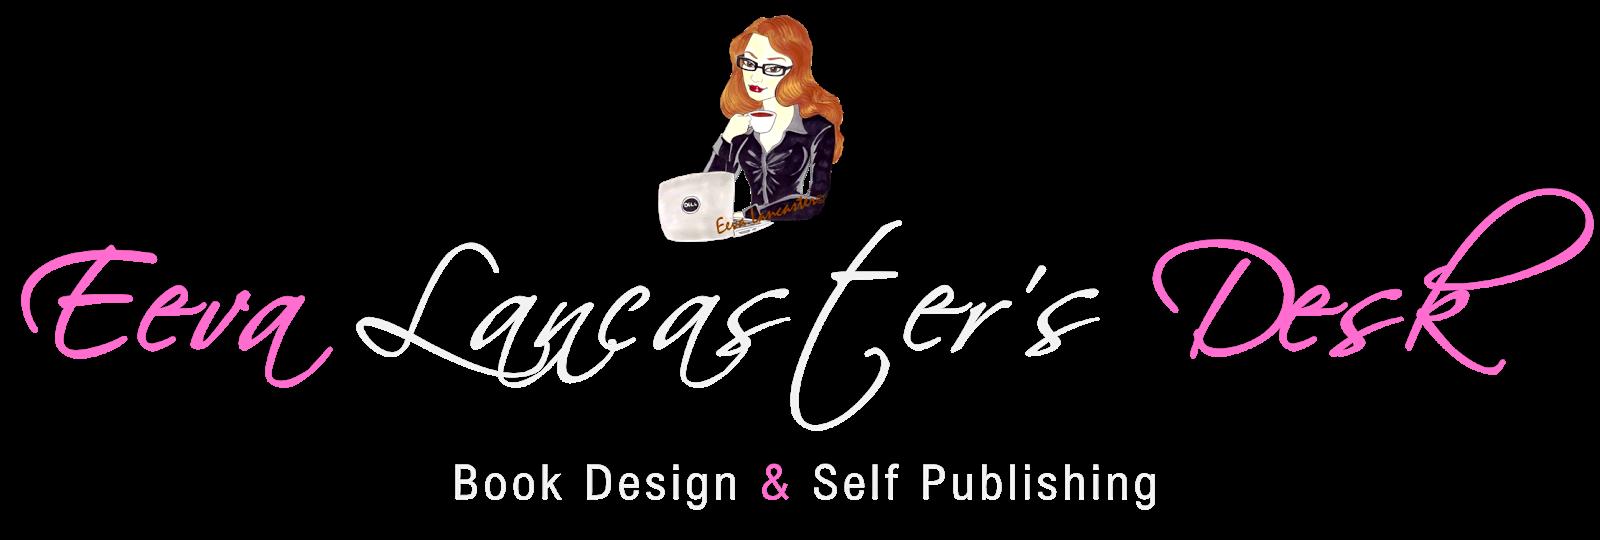 Eeva Lancaster's Desk